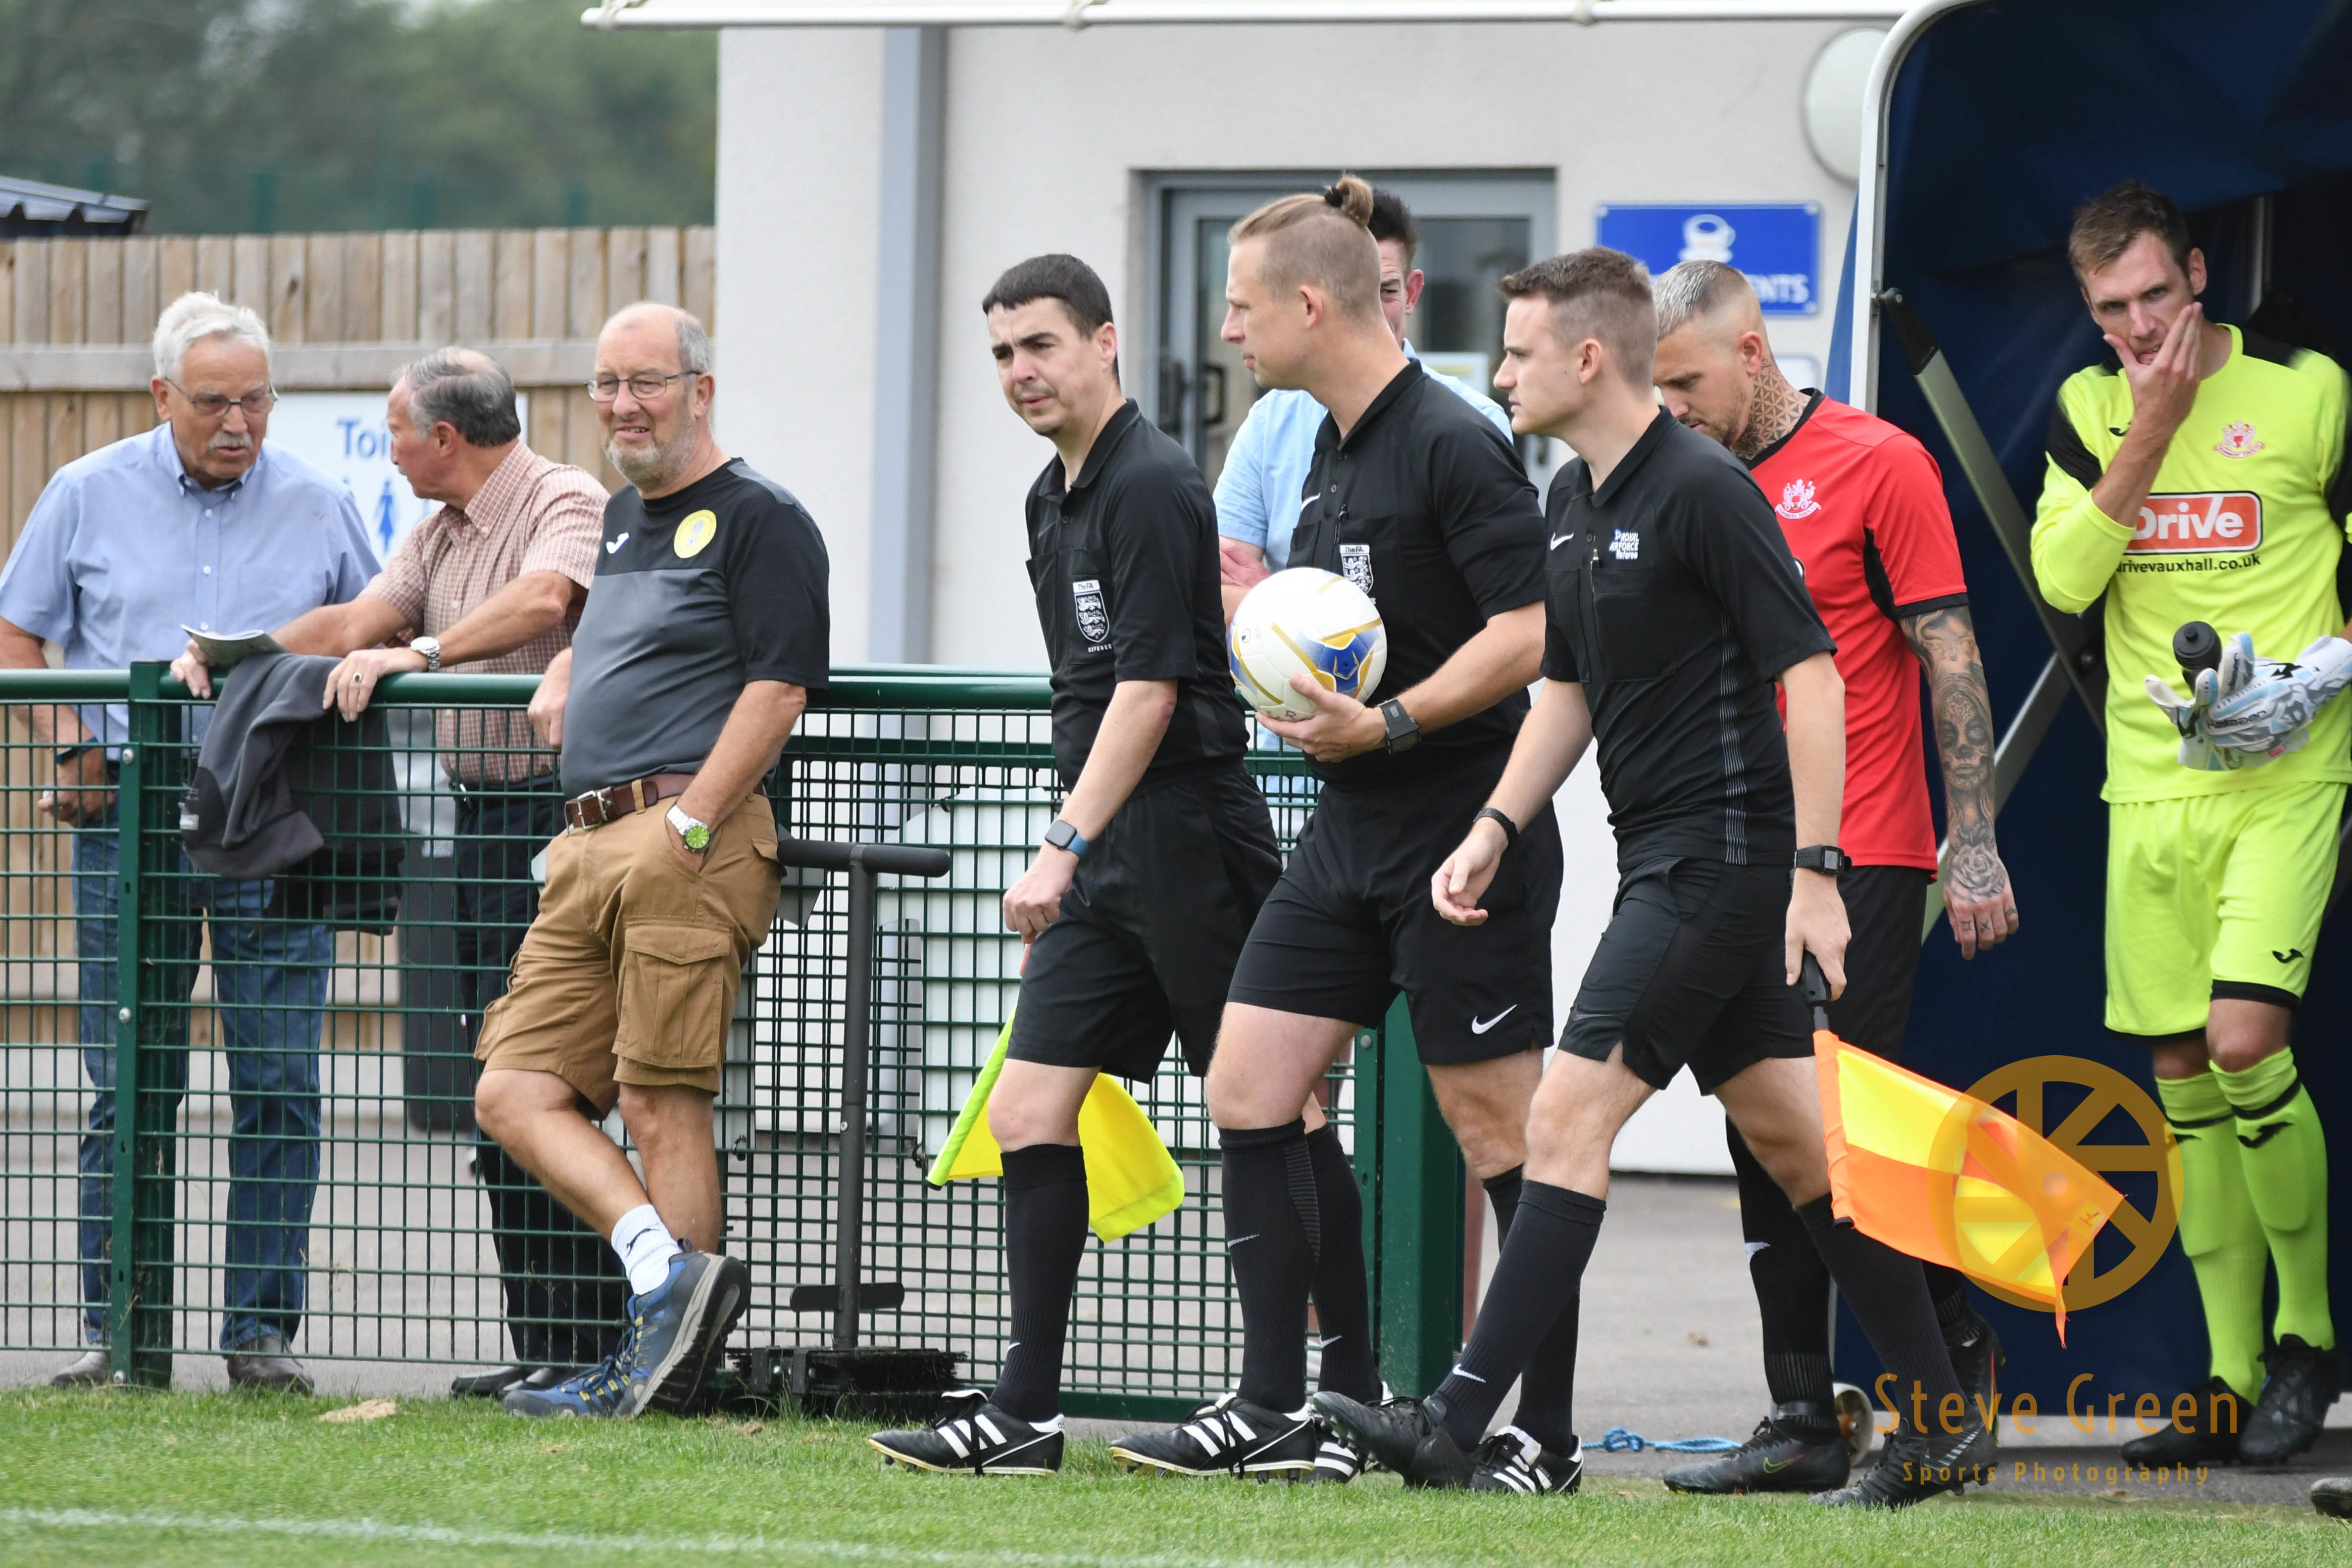 Photos from Royal Wootton Bassett Town's 2-0 win against Thornbury (Credit: Steve Green)